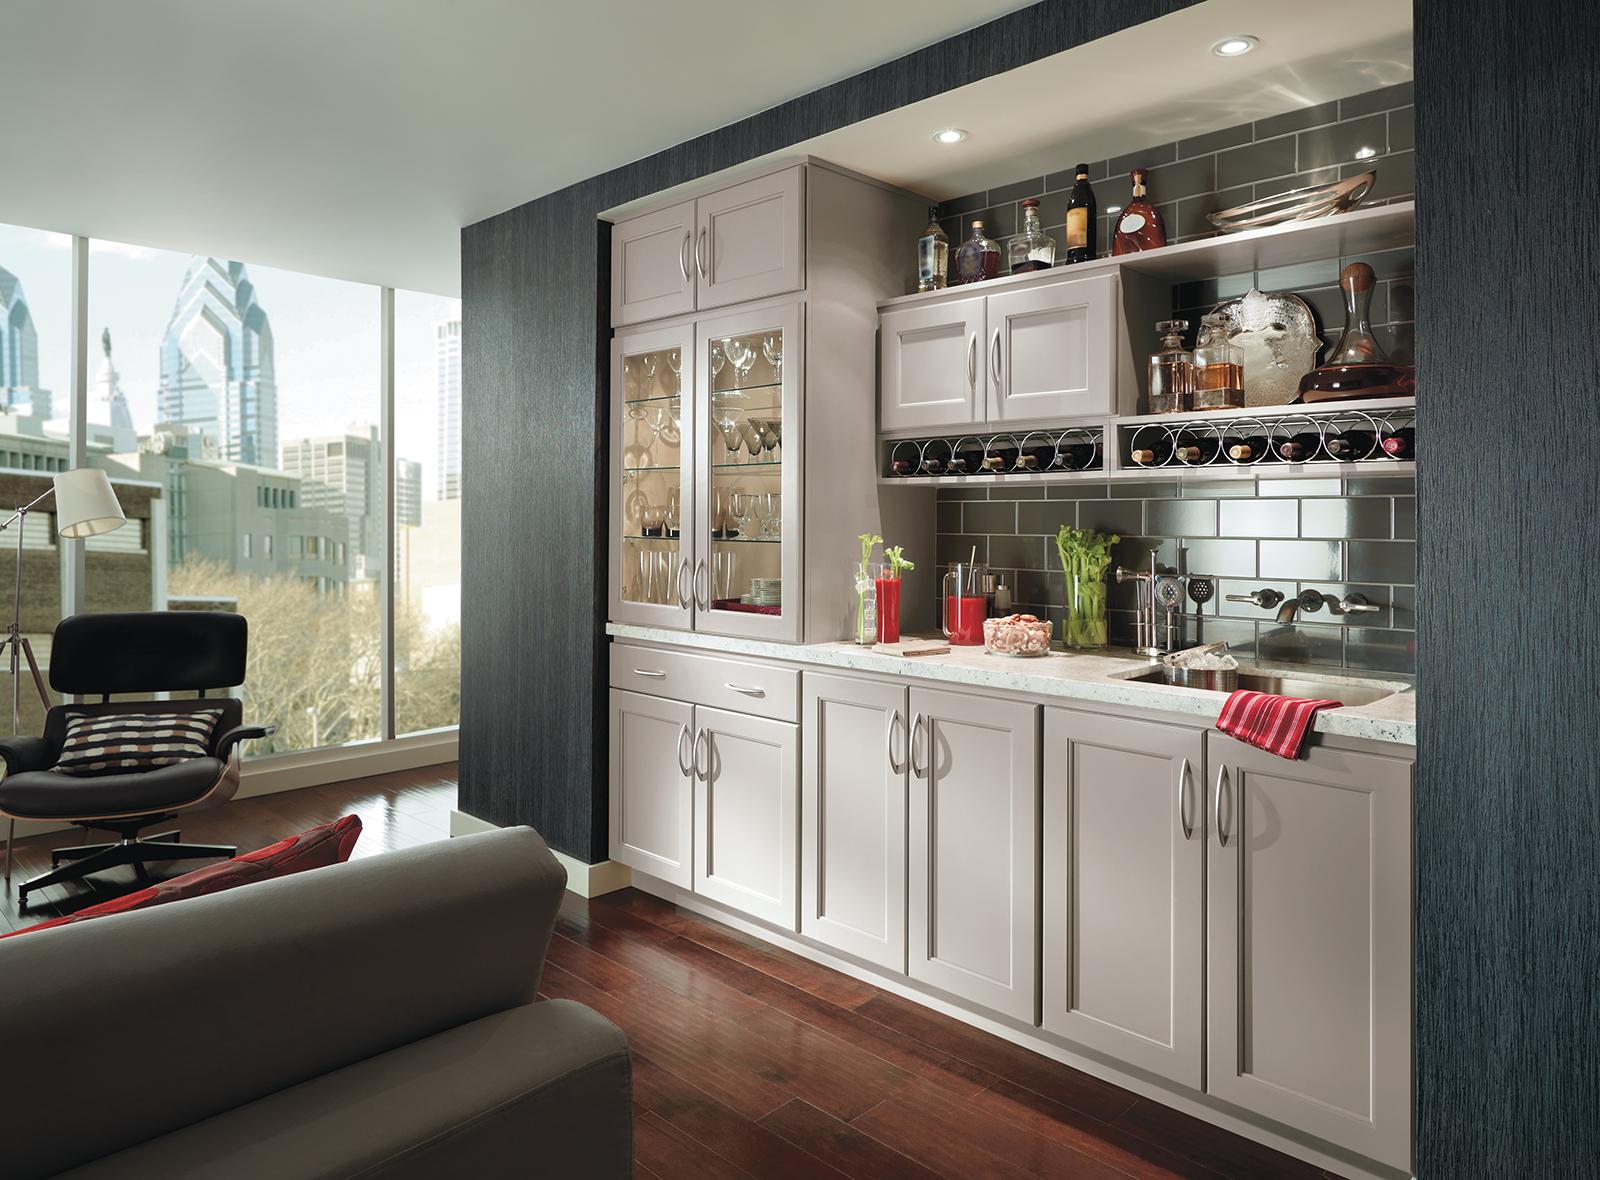 Homecrest Hershing Cabinetry